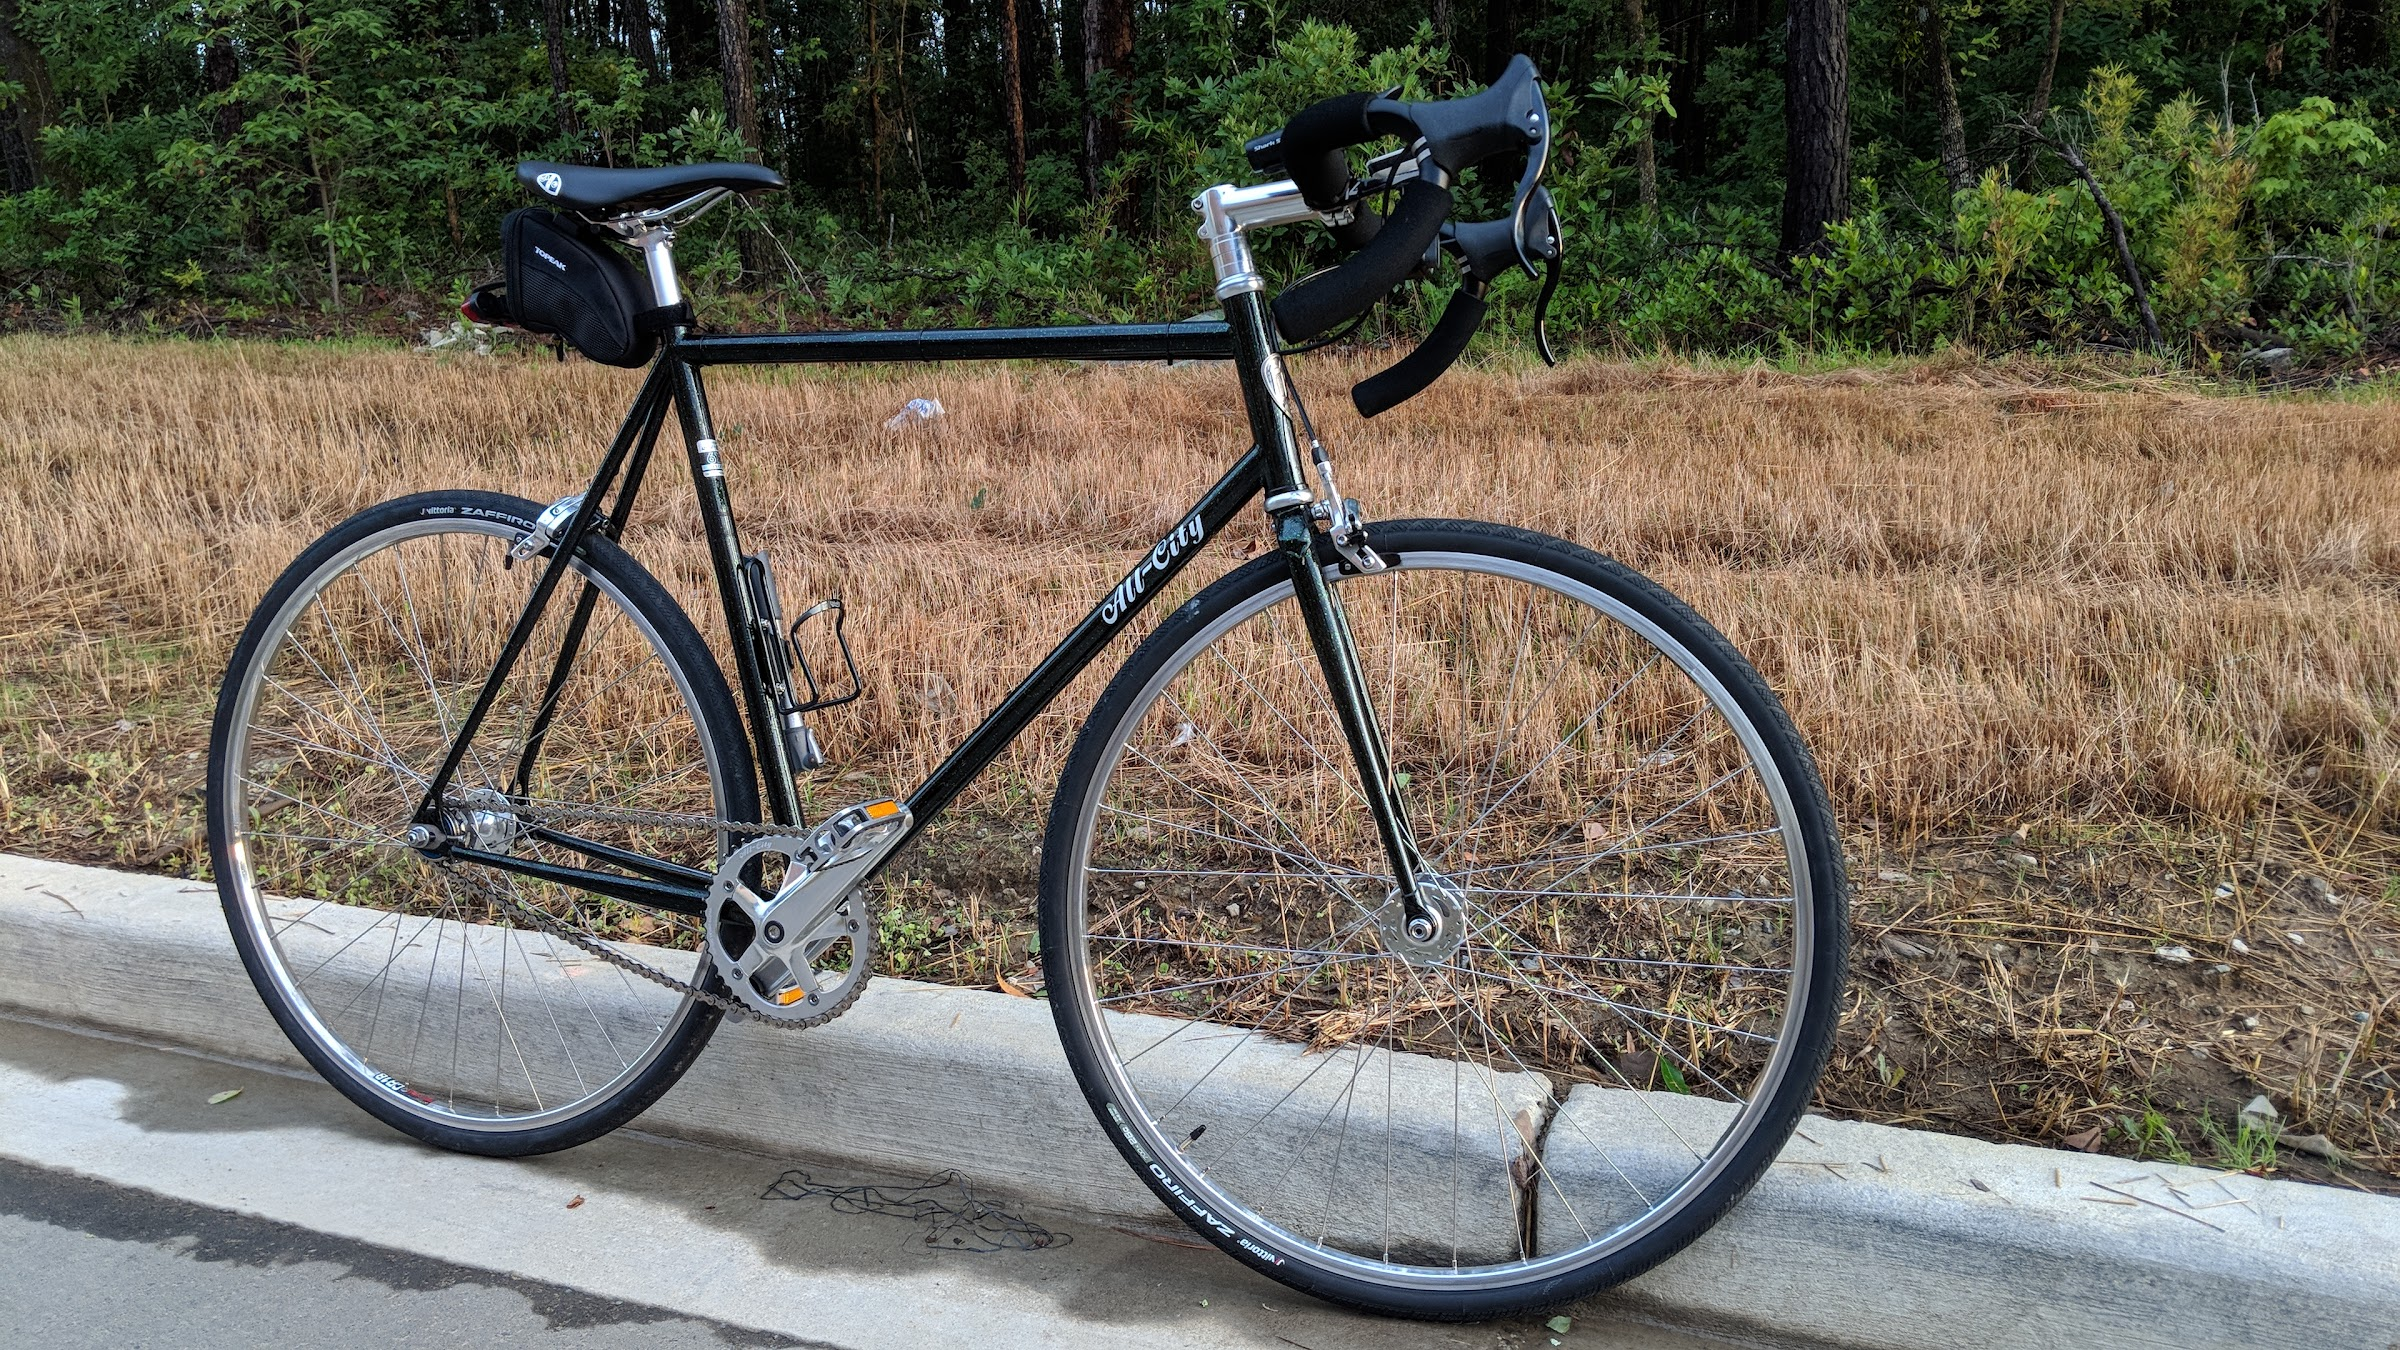 All-City Big Block bicycle